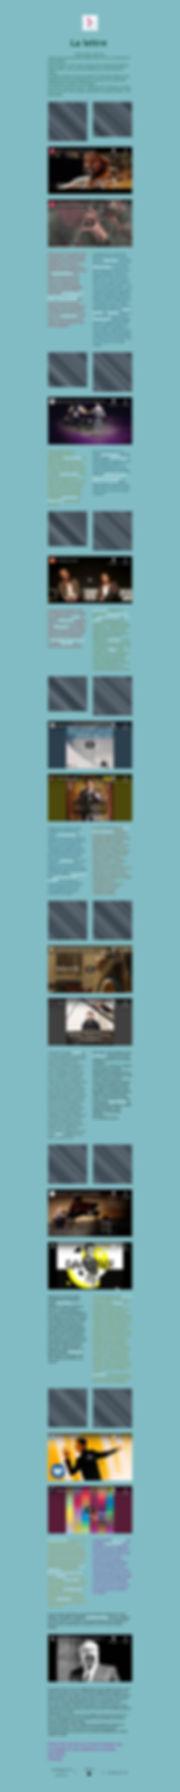 XIX XX_page-0001.jpg